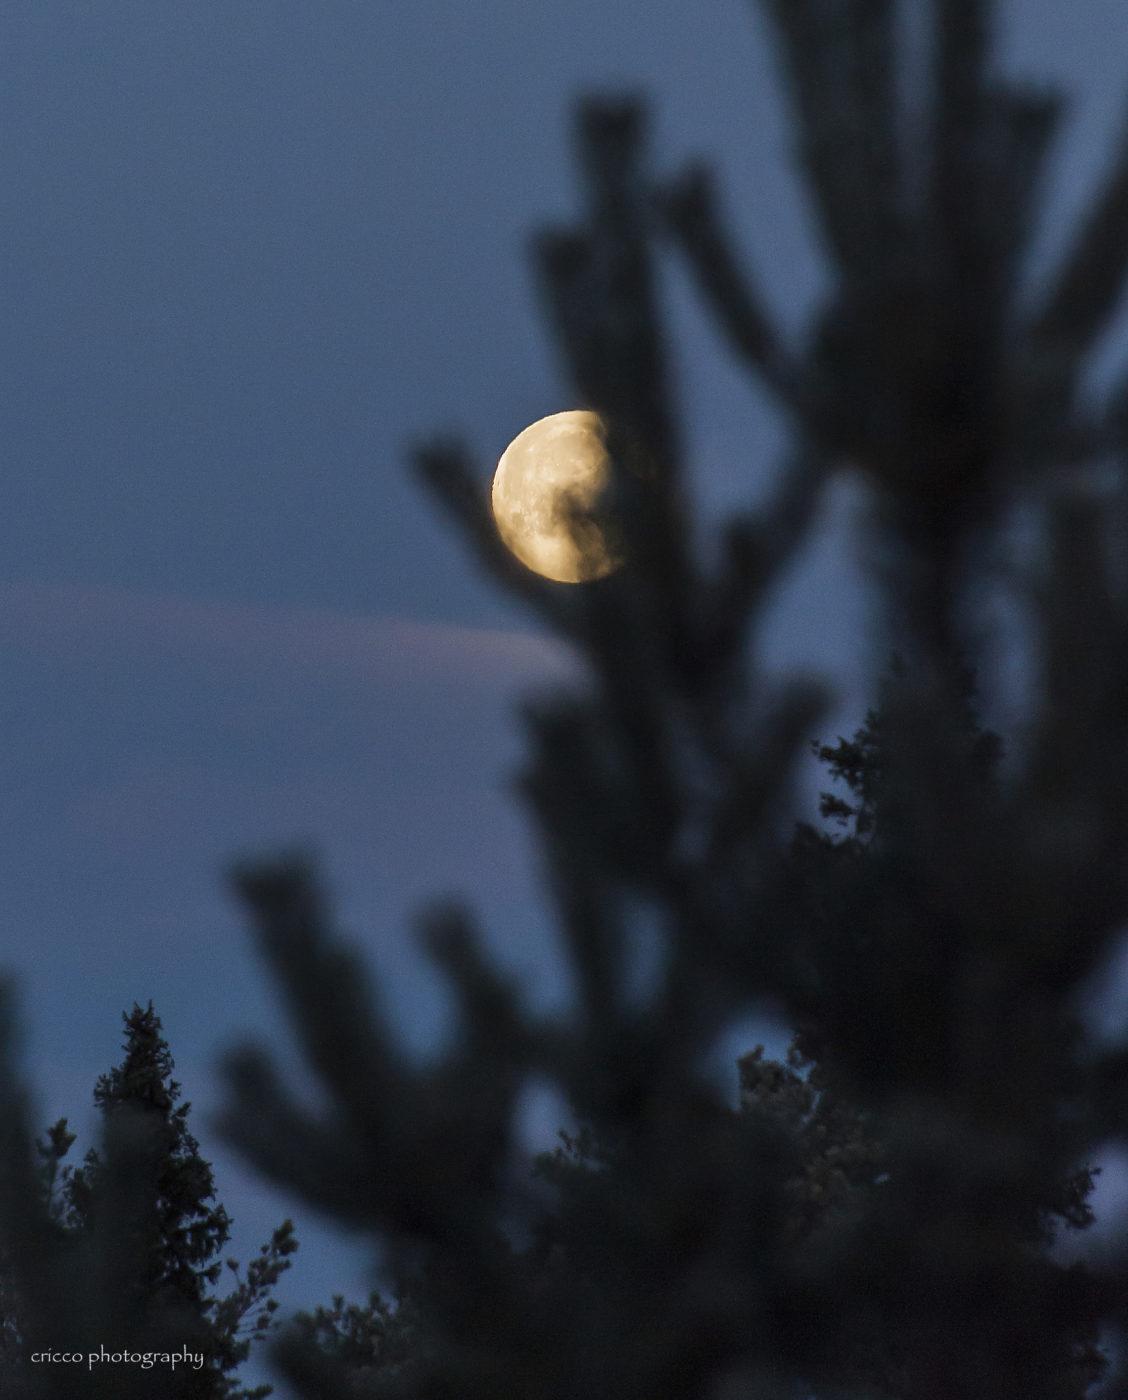 5 december - Cricco blyg morgonmåne